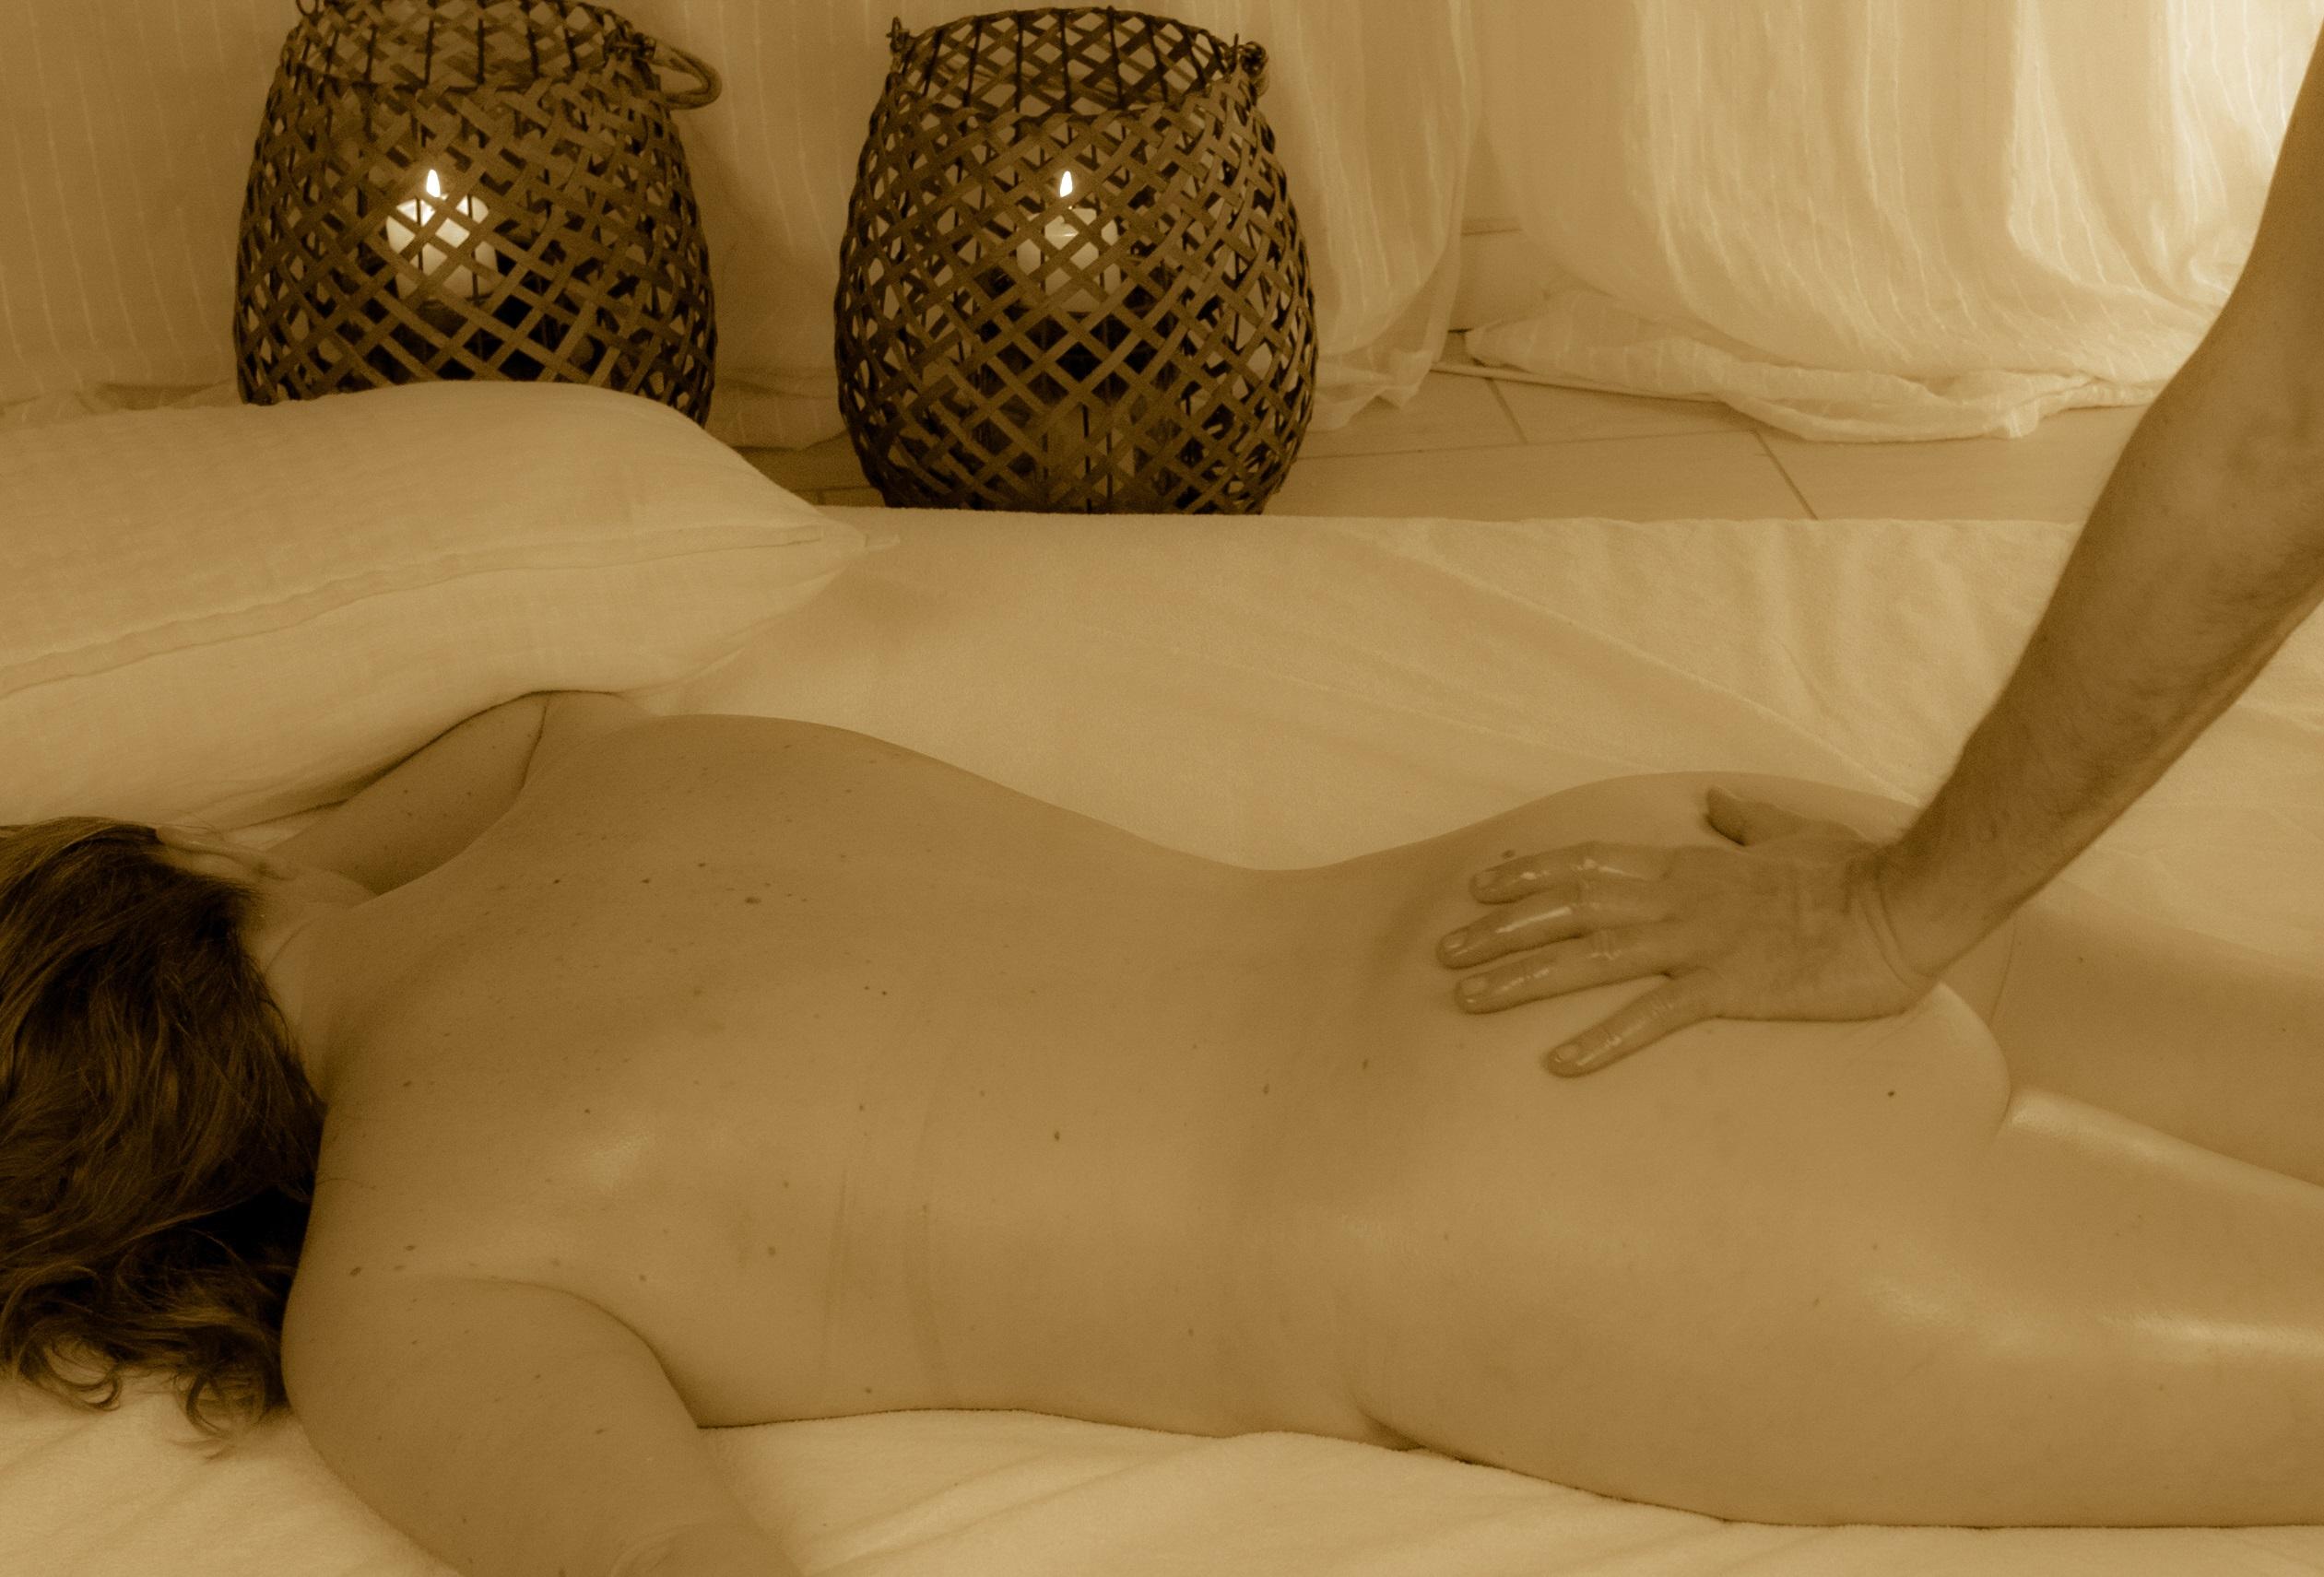 bøsse porno tantra massage kolding